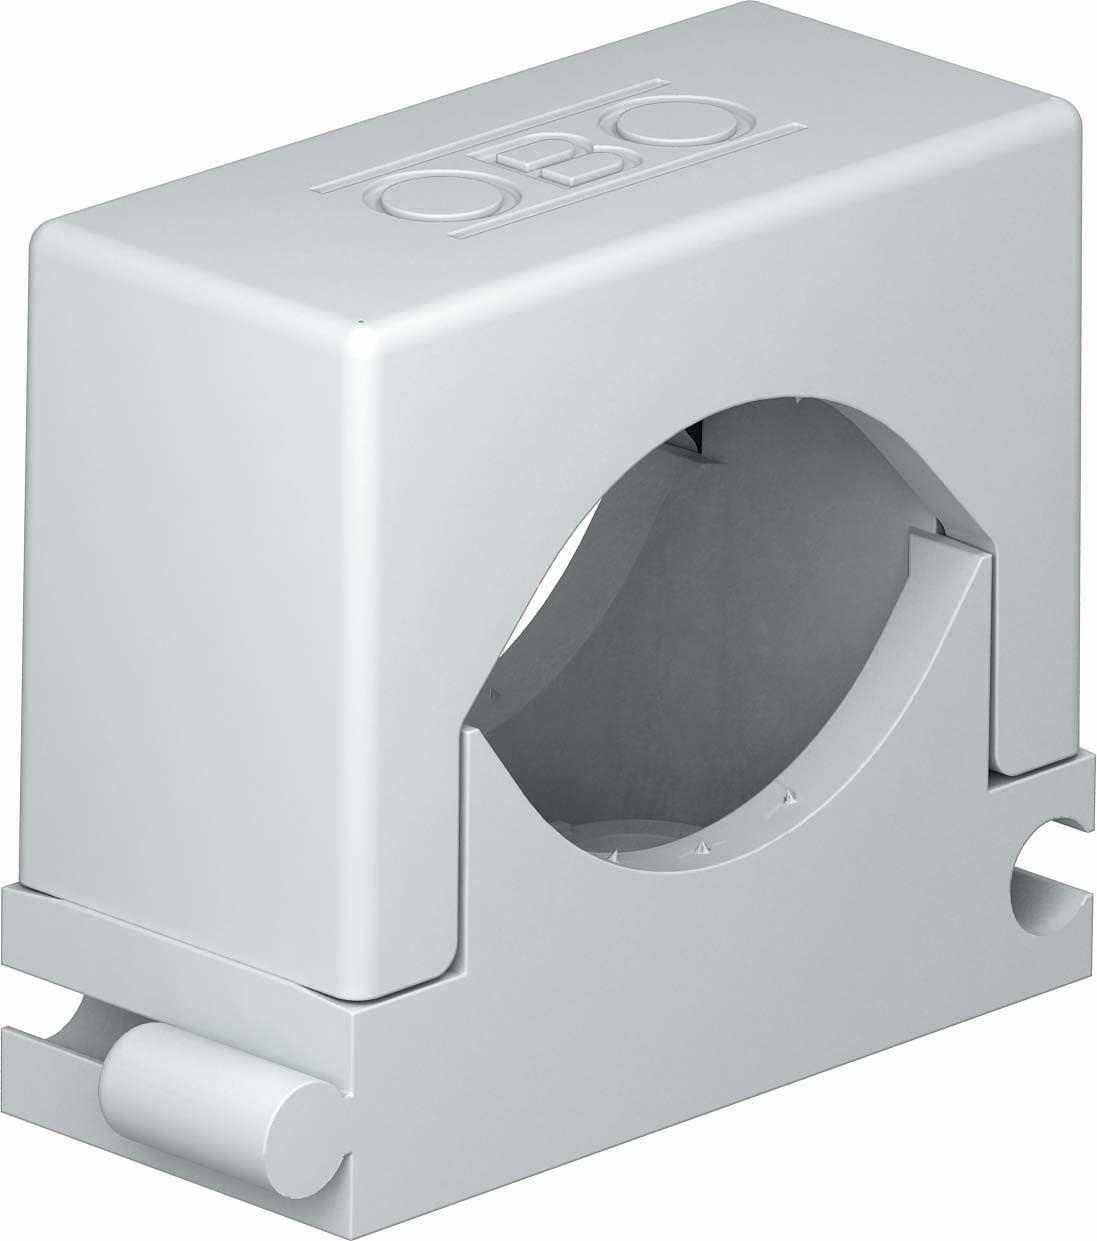 obo-bettermann System conex. IJF. Schelle 2037/18–30mm